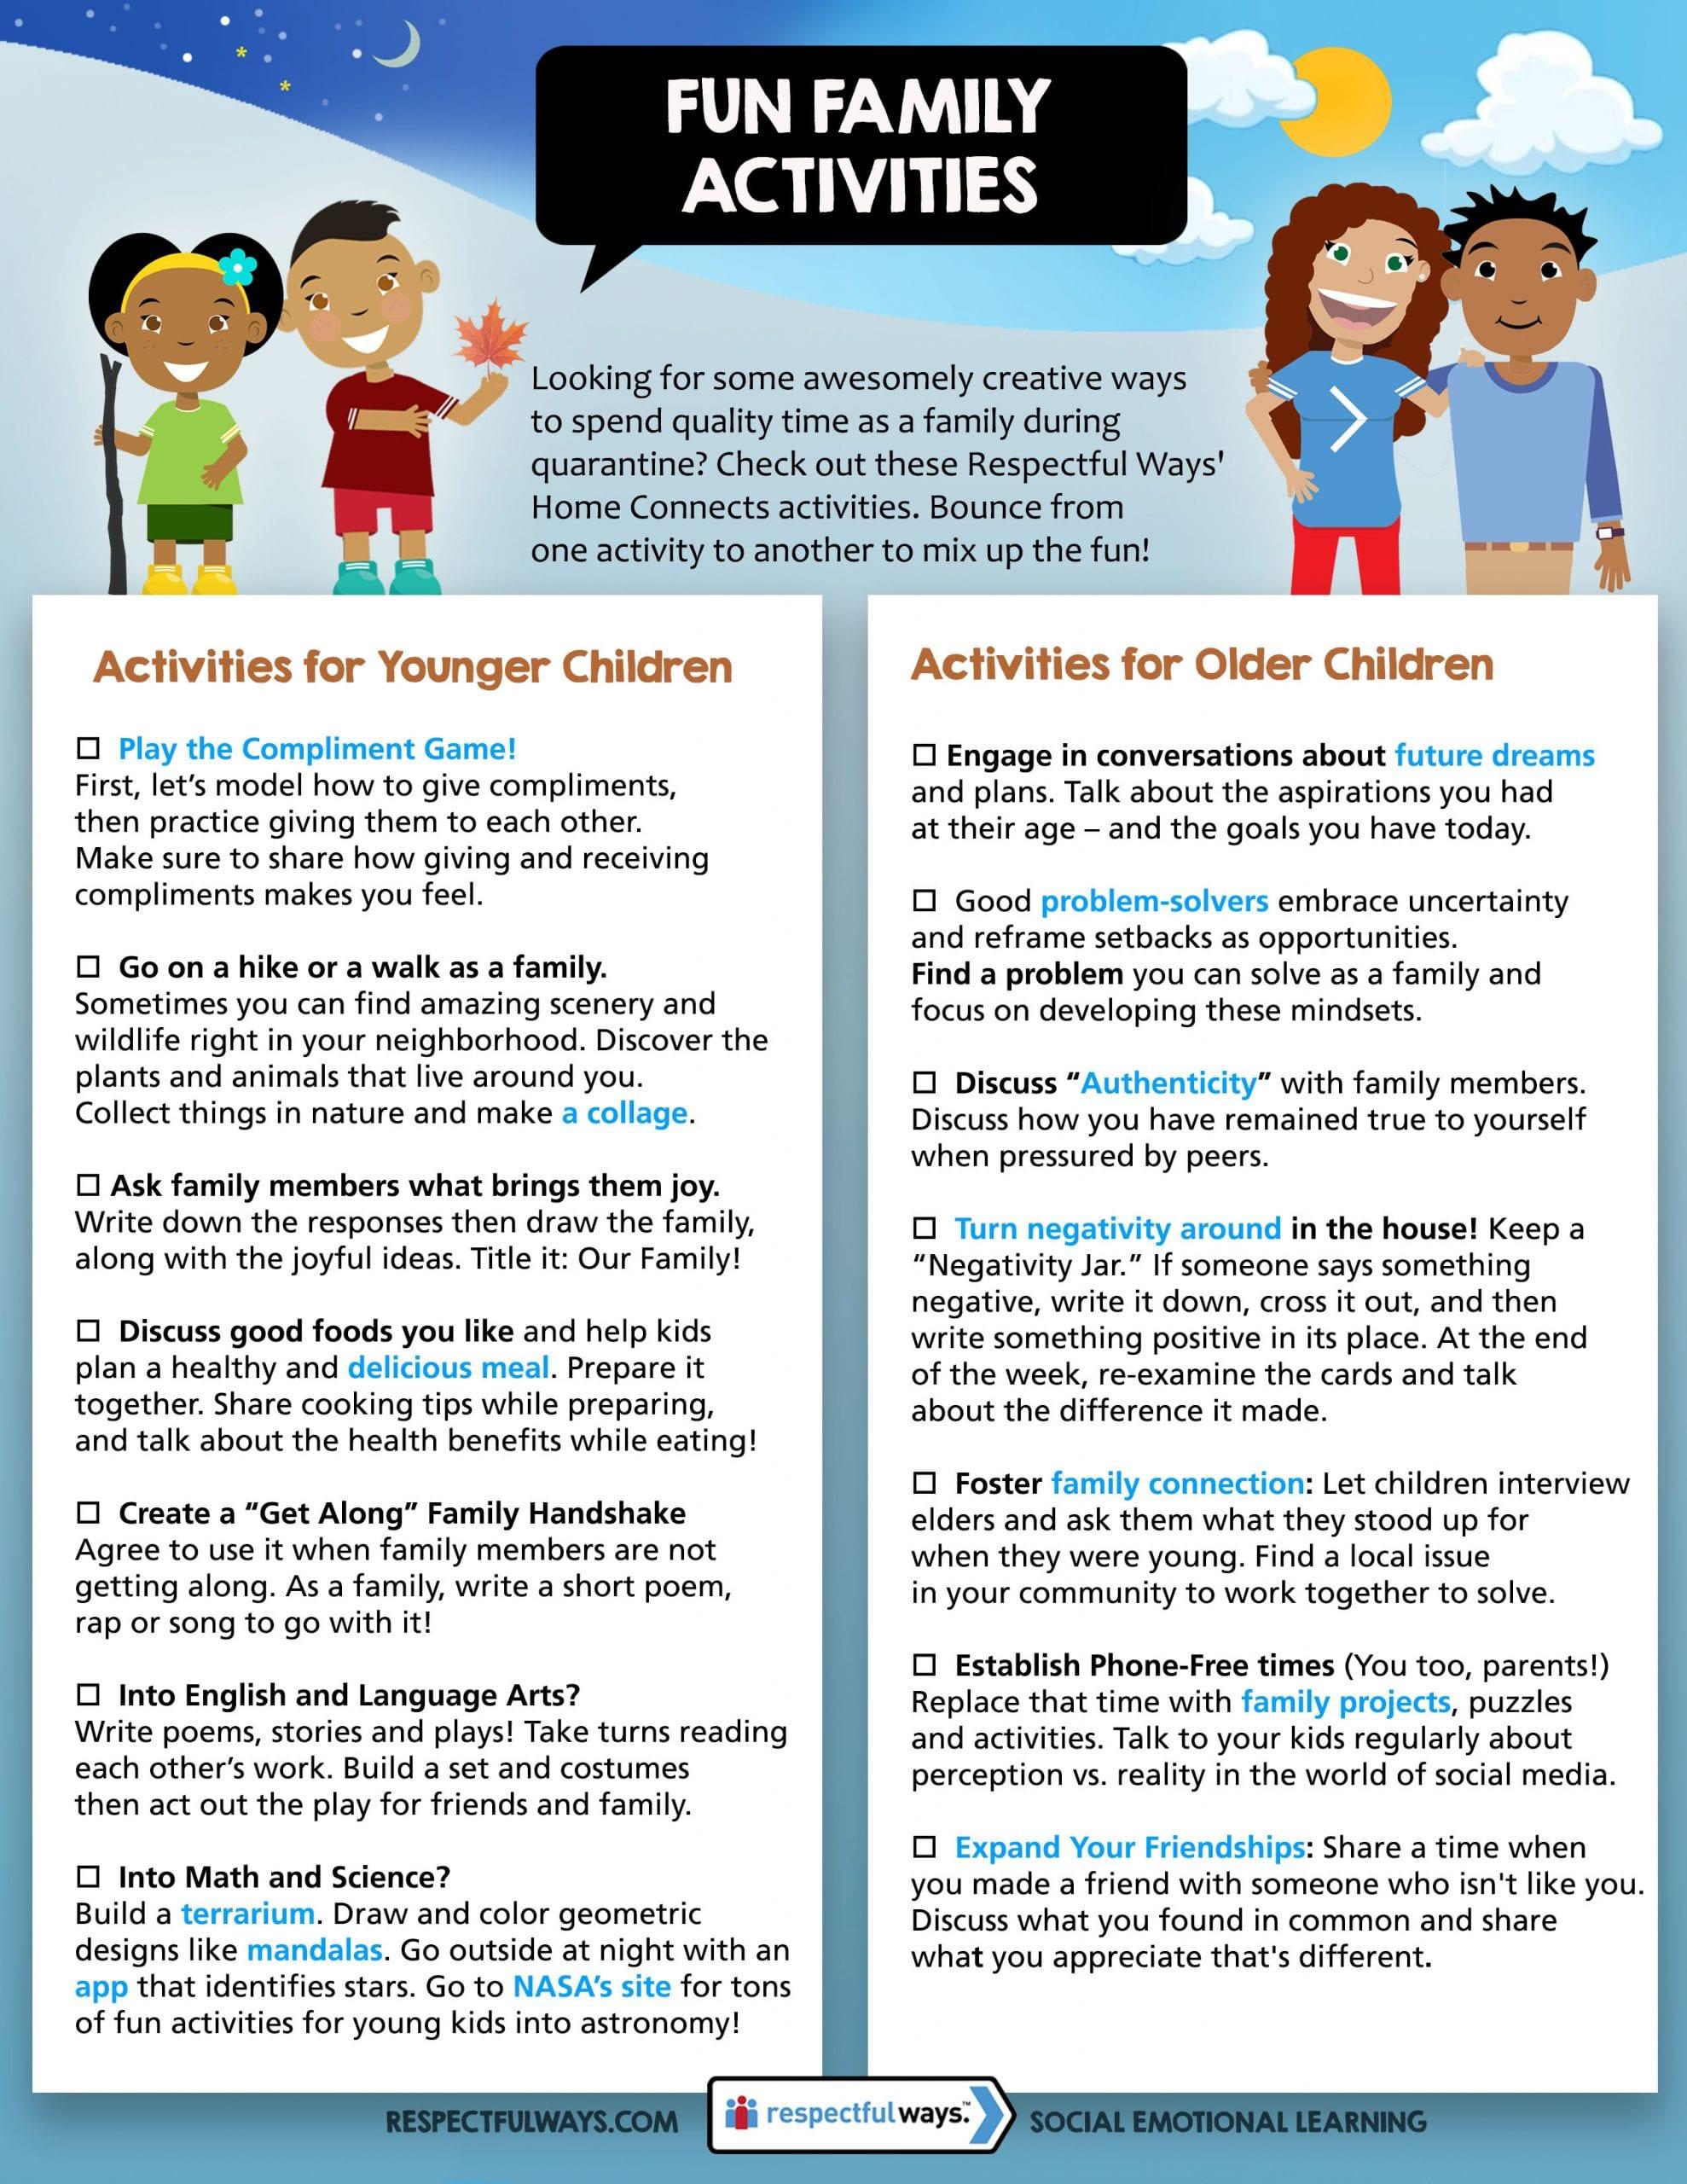 Respectful Ways Family Fun Activities Checklist